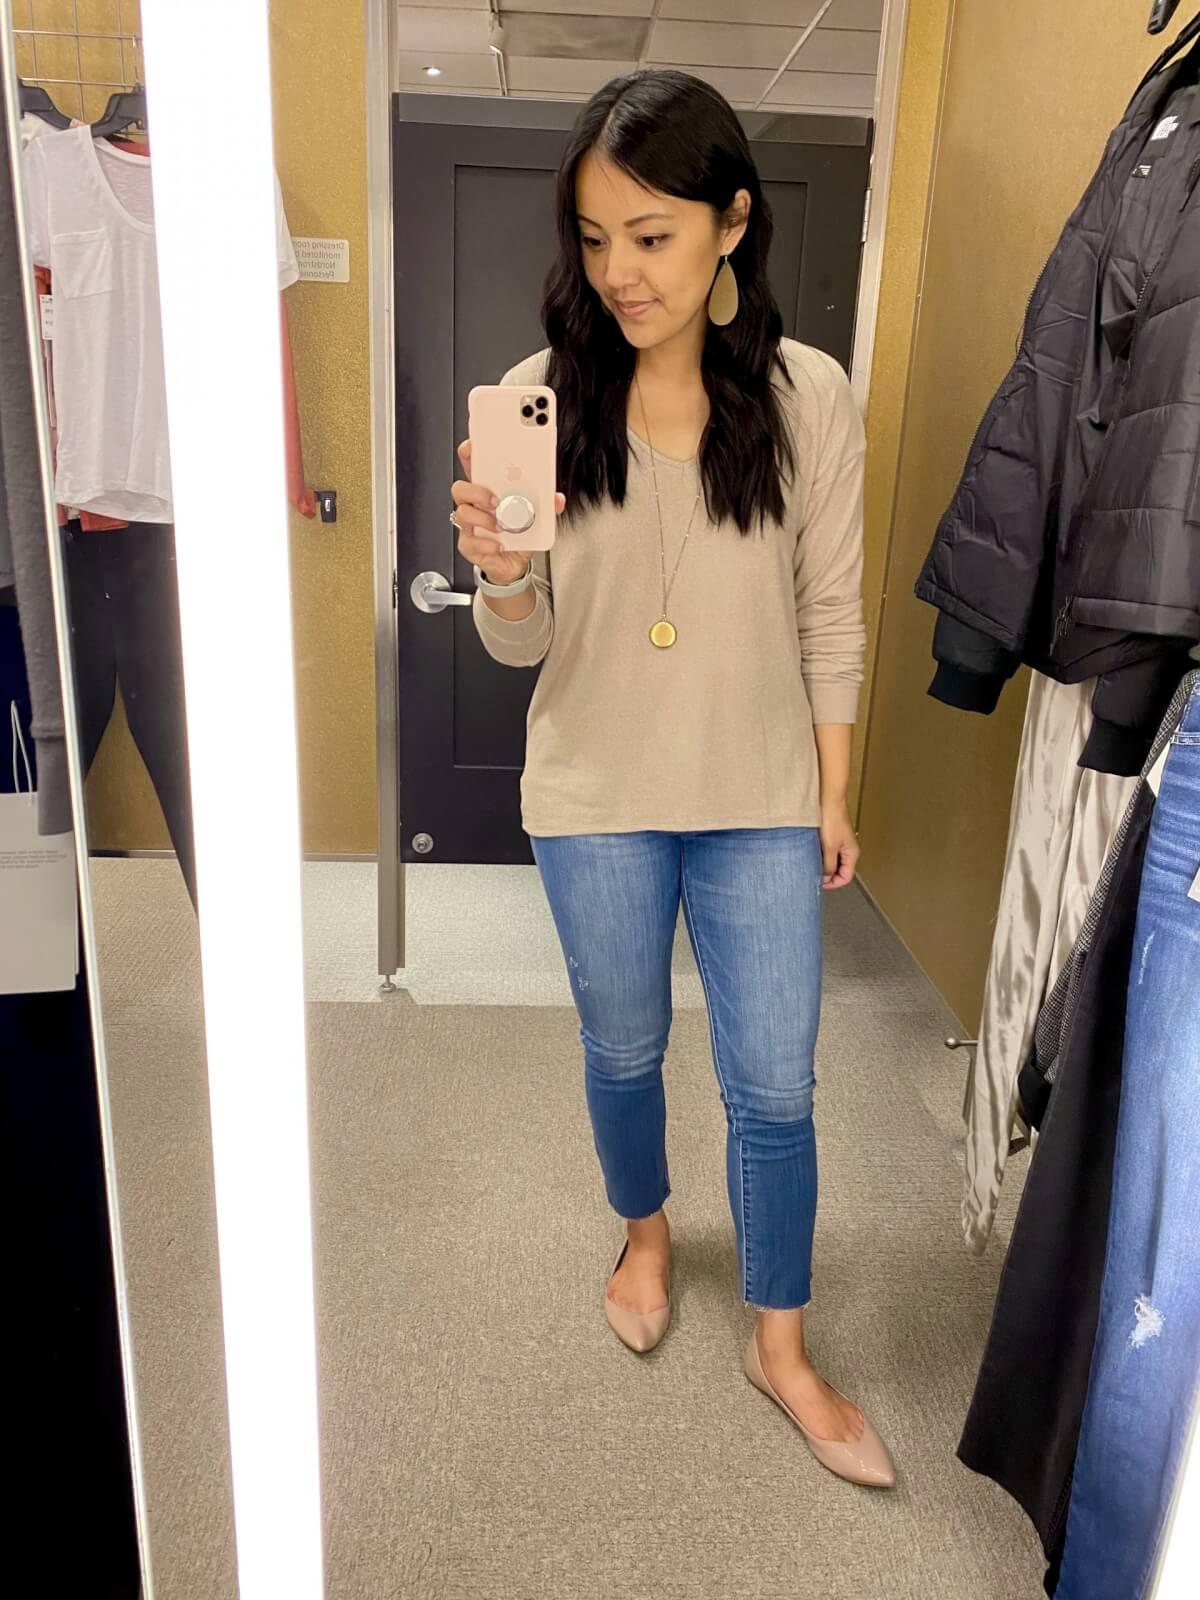 Gibsonlook beige sweater + light denim jeans + gold earrings + gold pendant necklace + nude flats